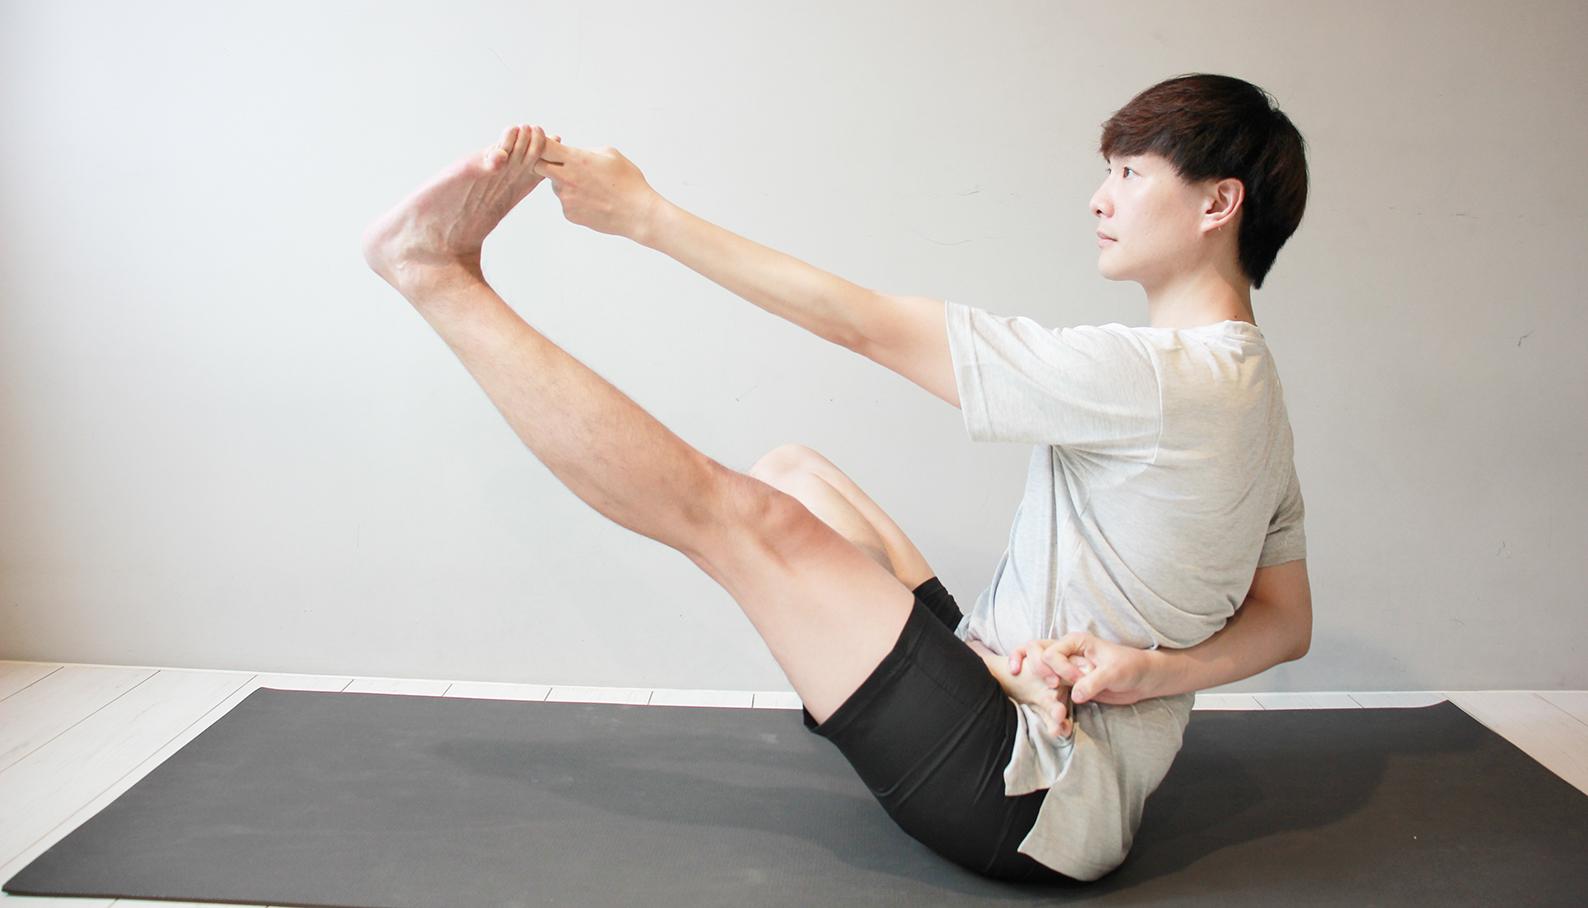 Yoga Teacher — William<br /><p>我相信,瑜珈練習,根源於一個文化的深度內省,而我們是增添對他的註解。最初的相遇,是與 Ashtanga八肢瑜珈的接觸</p>